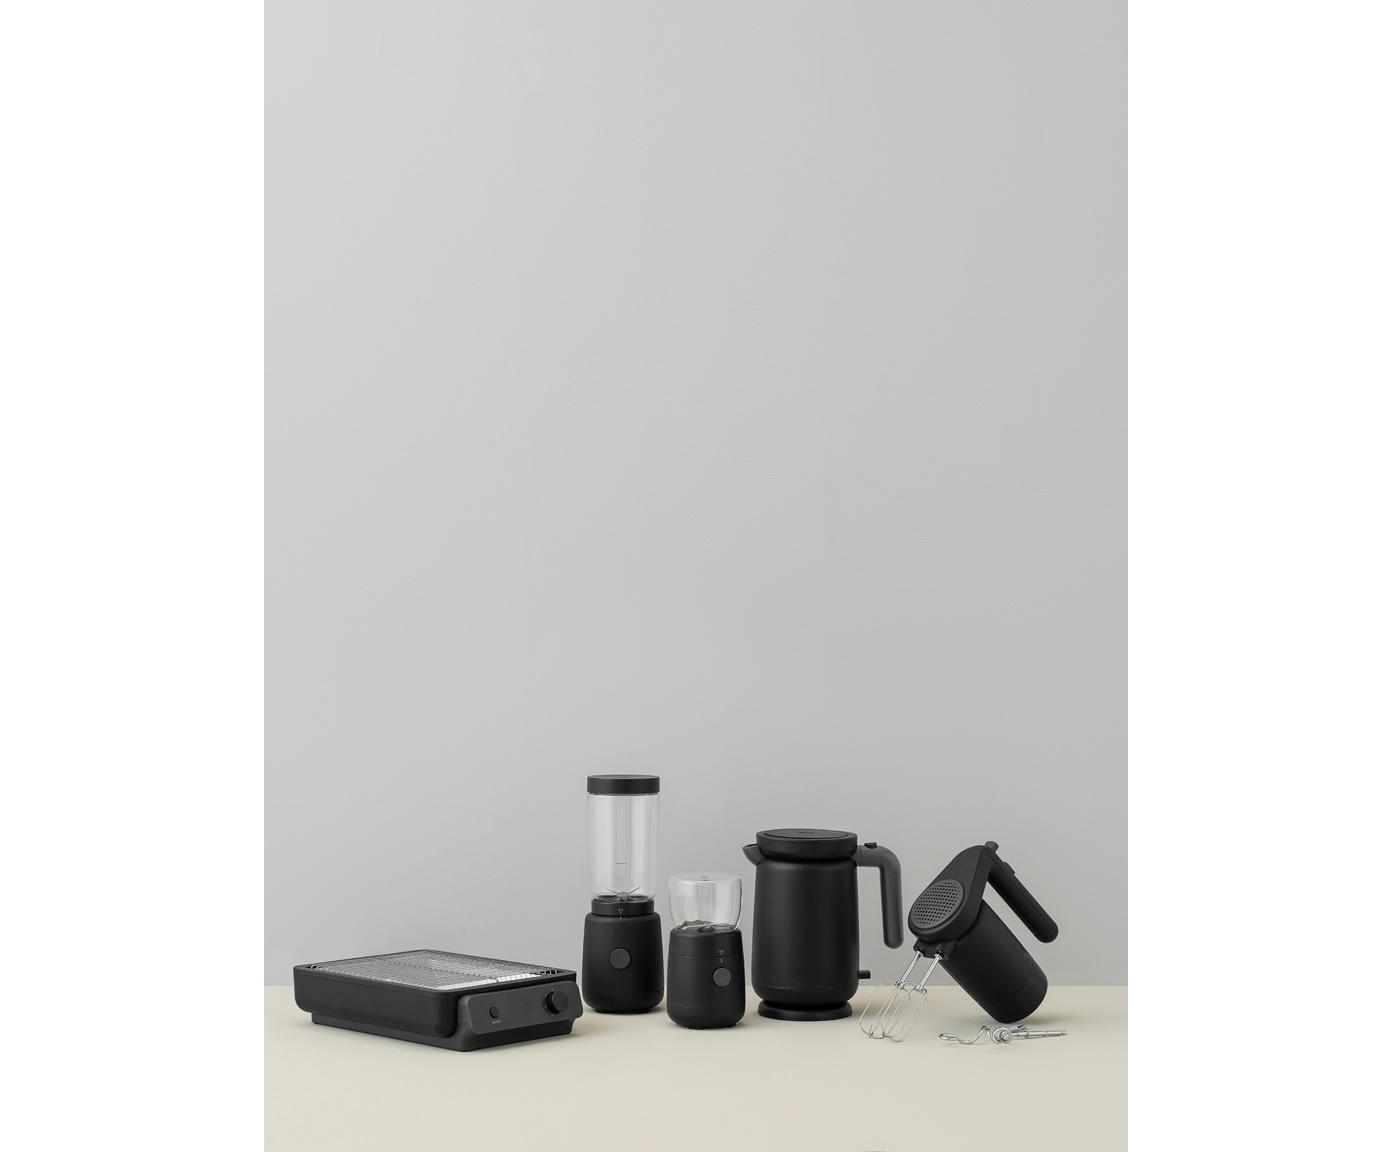 Handrührgerät Foodie, Gehäuse: Kunststoff, Schwarz, 19 x 17 cm